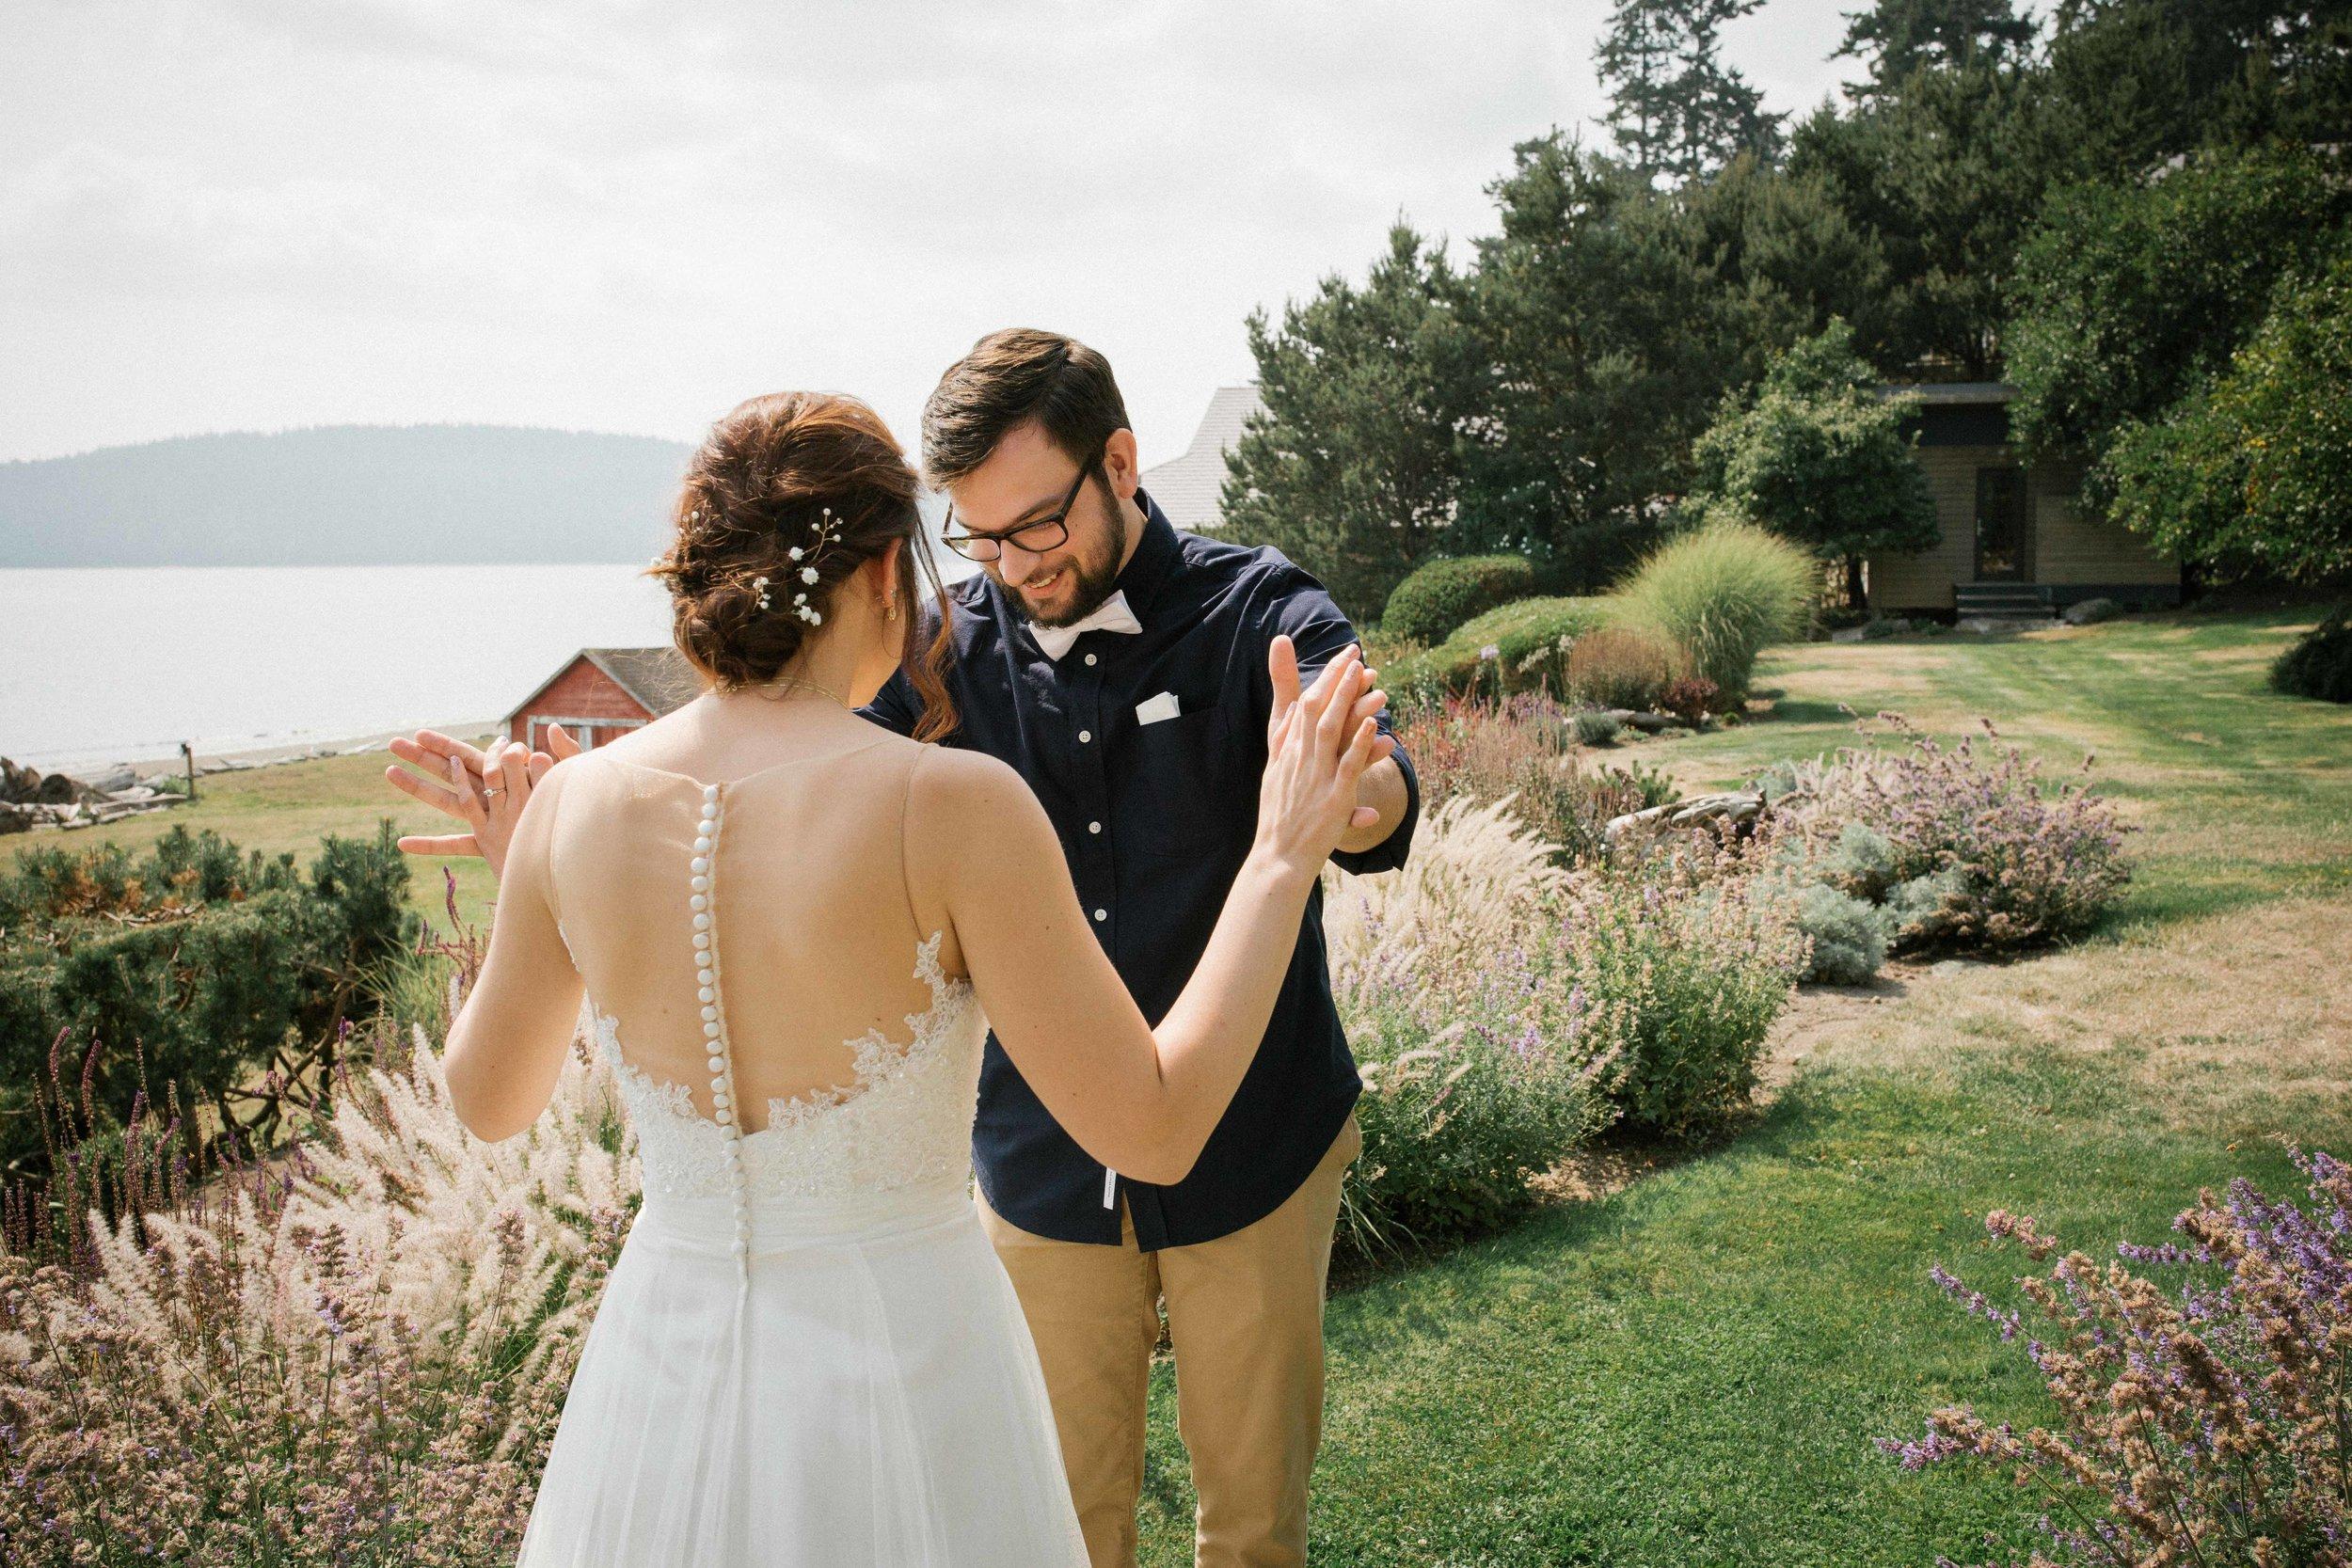 deception-pass-wedding-17.jpg